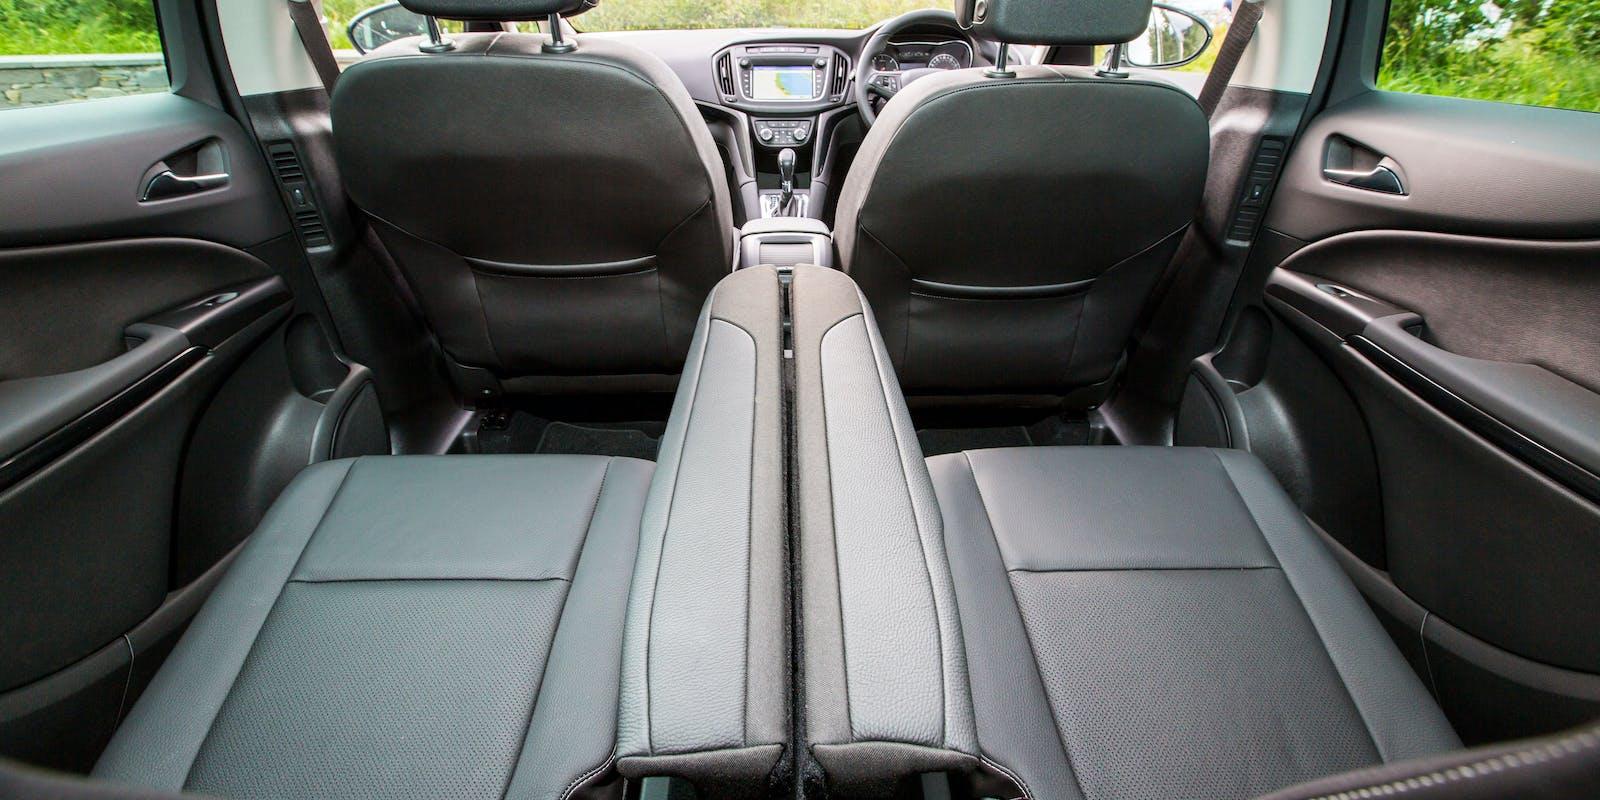 Vauxhall zafira tourer review carwow for Interior zafira tourer